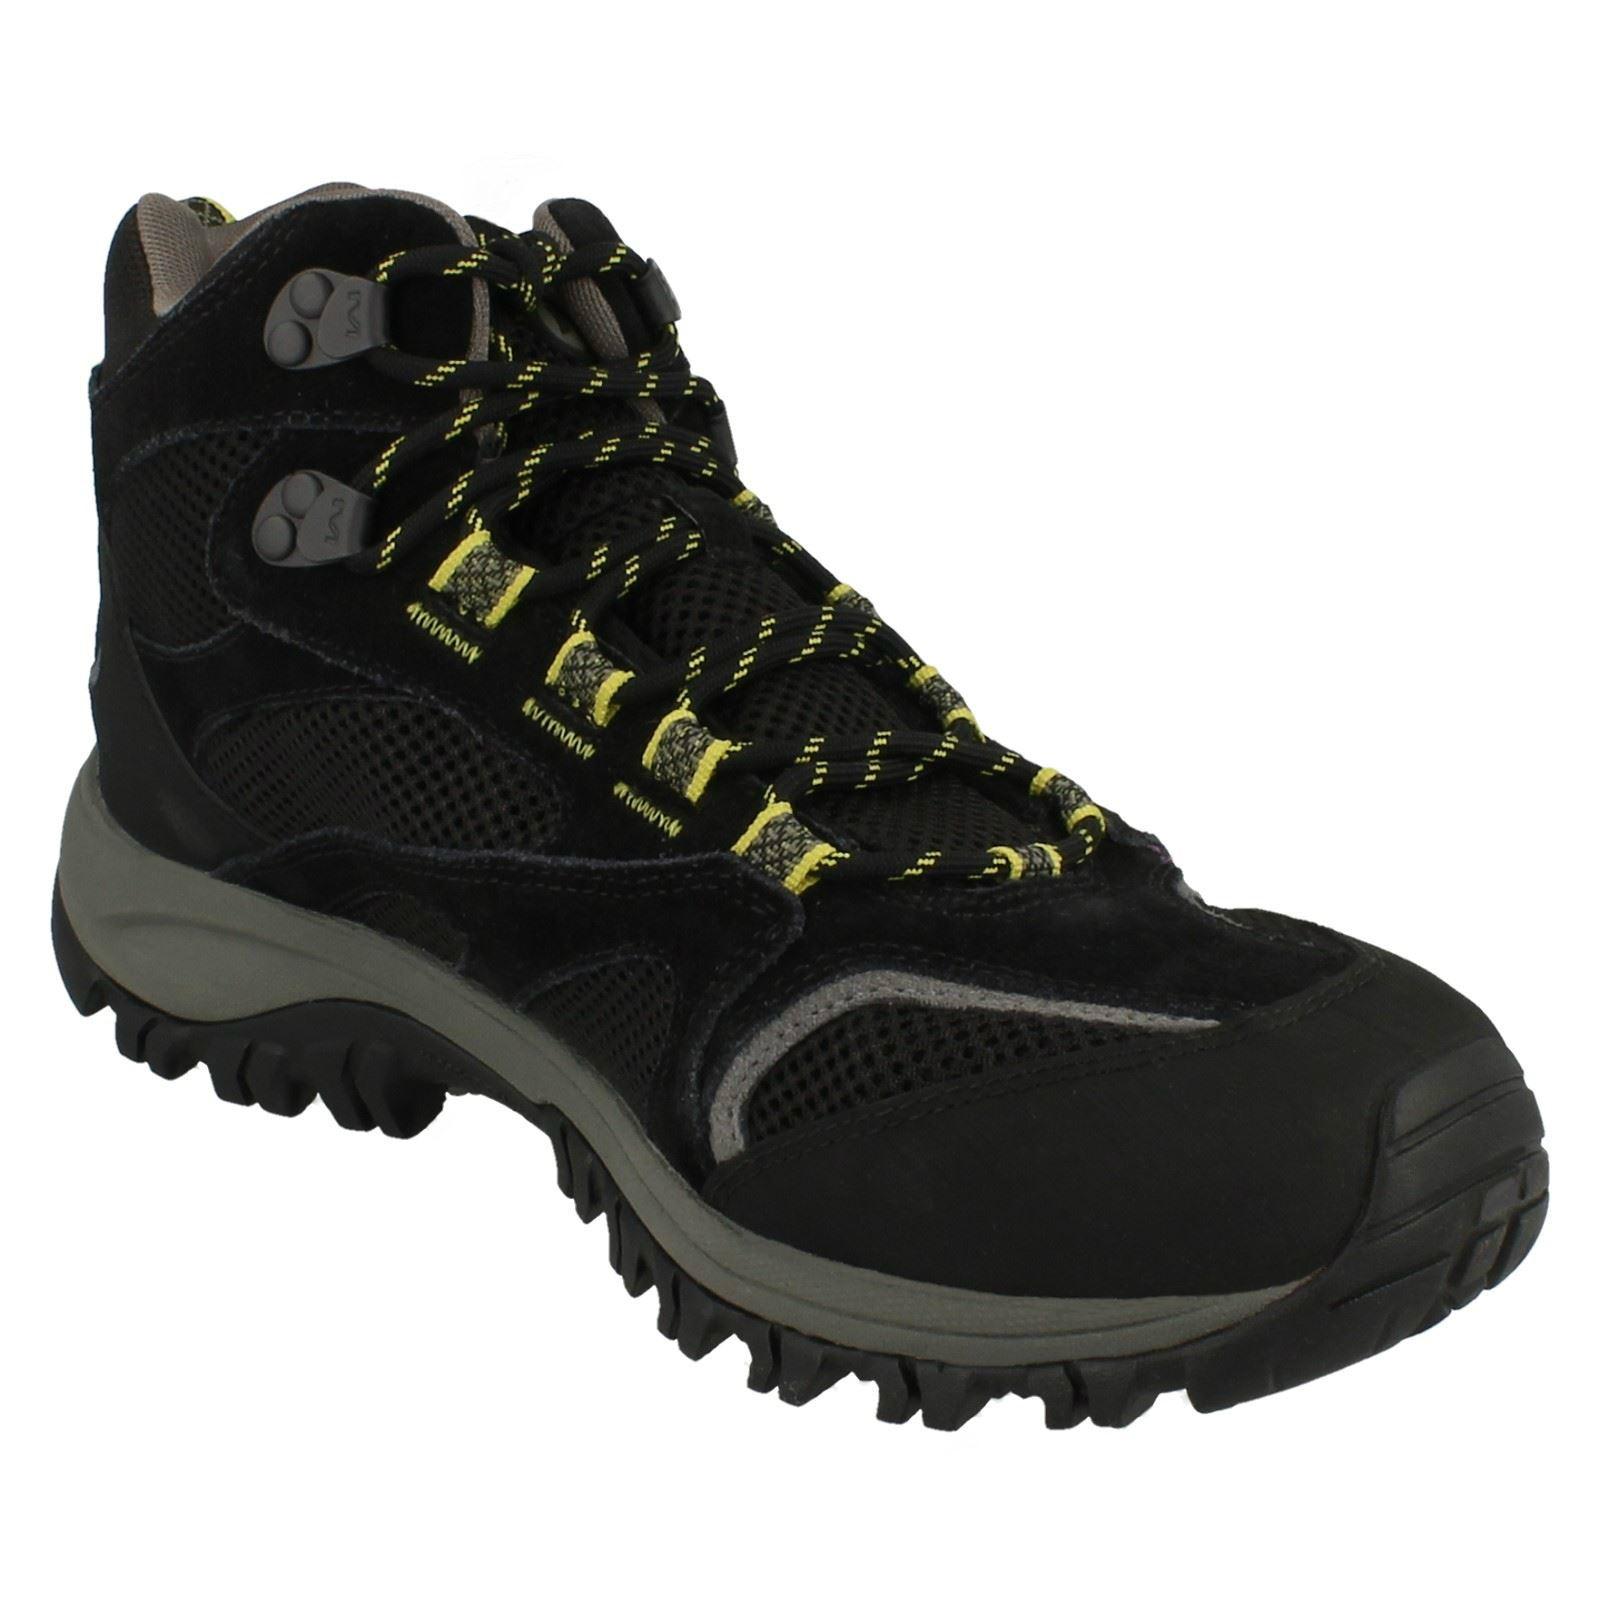 thumbnail 10 - Mens-Merrell-Waterproof-Walking-Boots-Phoenix-Mid